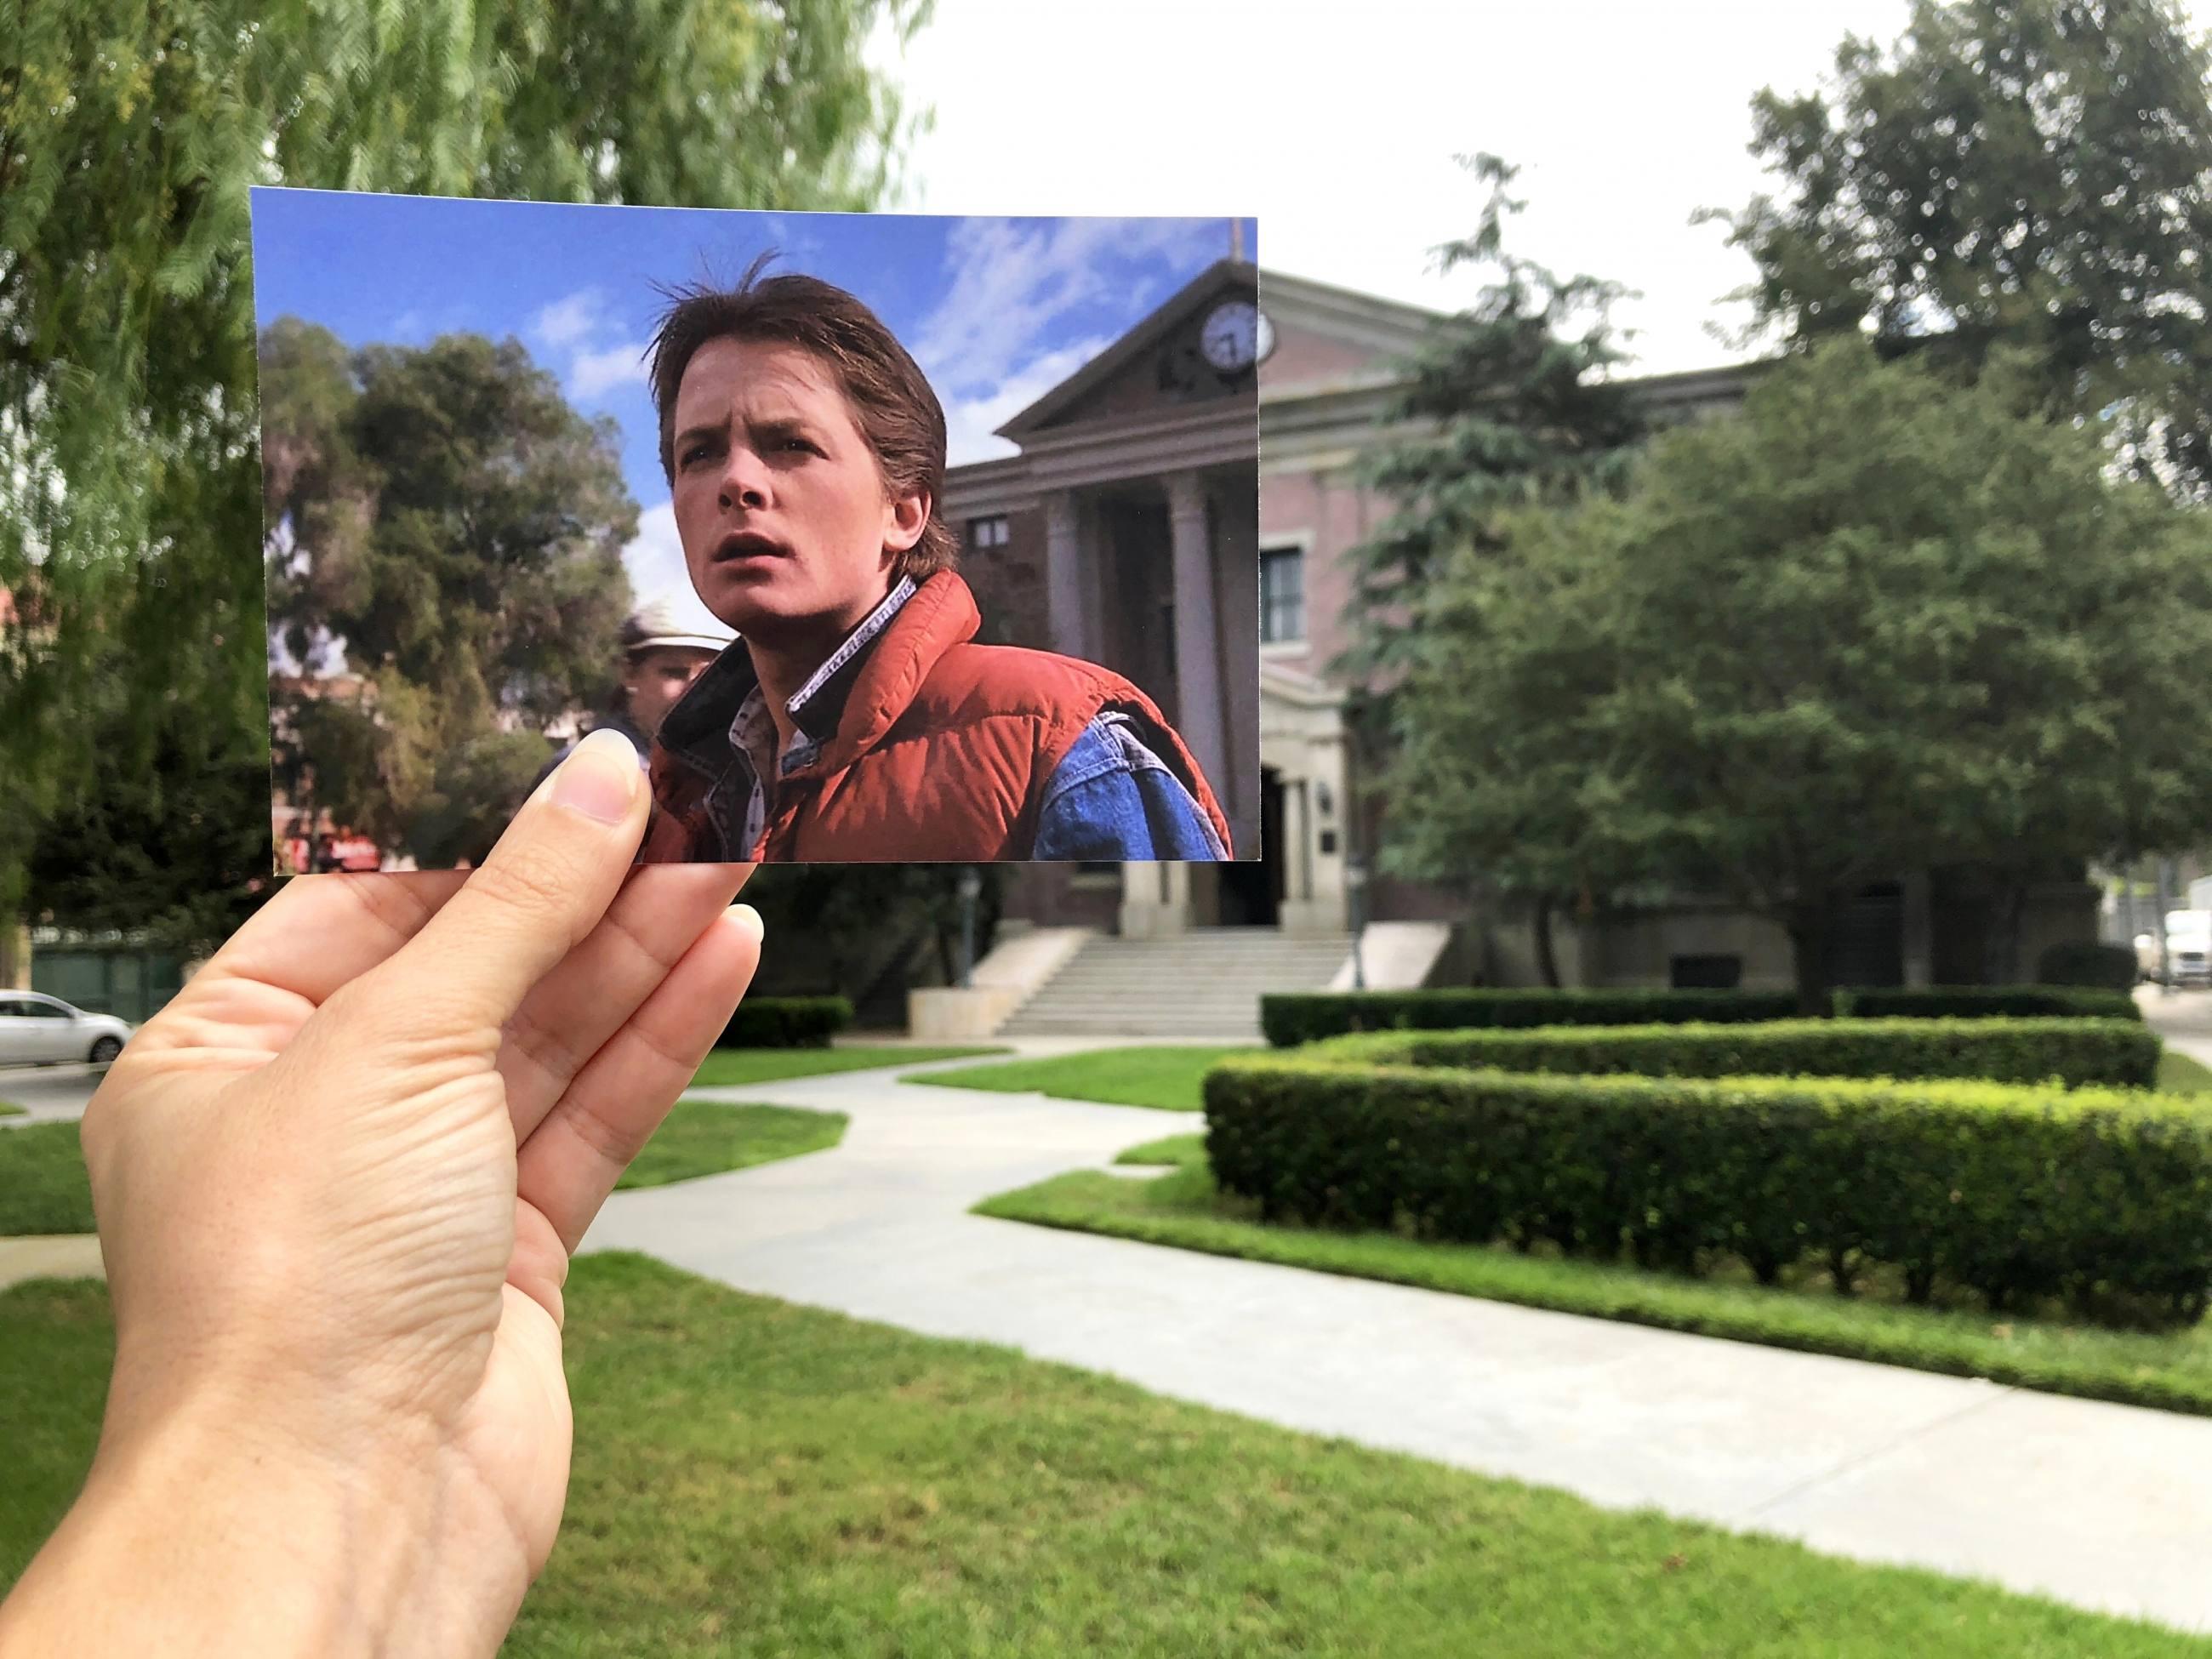 Back to the Future Universal Studios filmtourismus